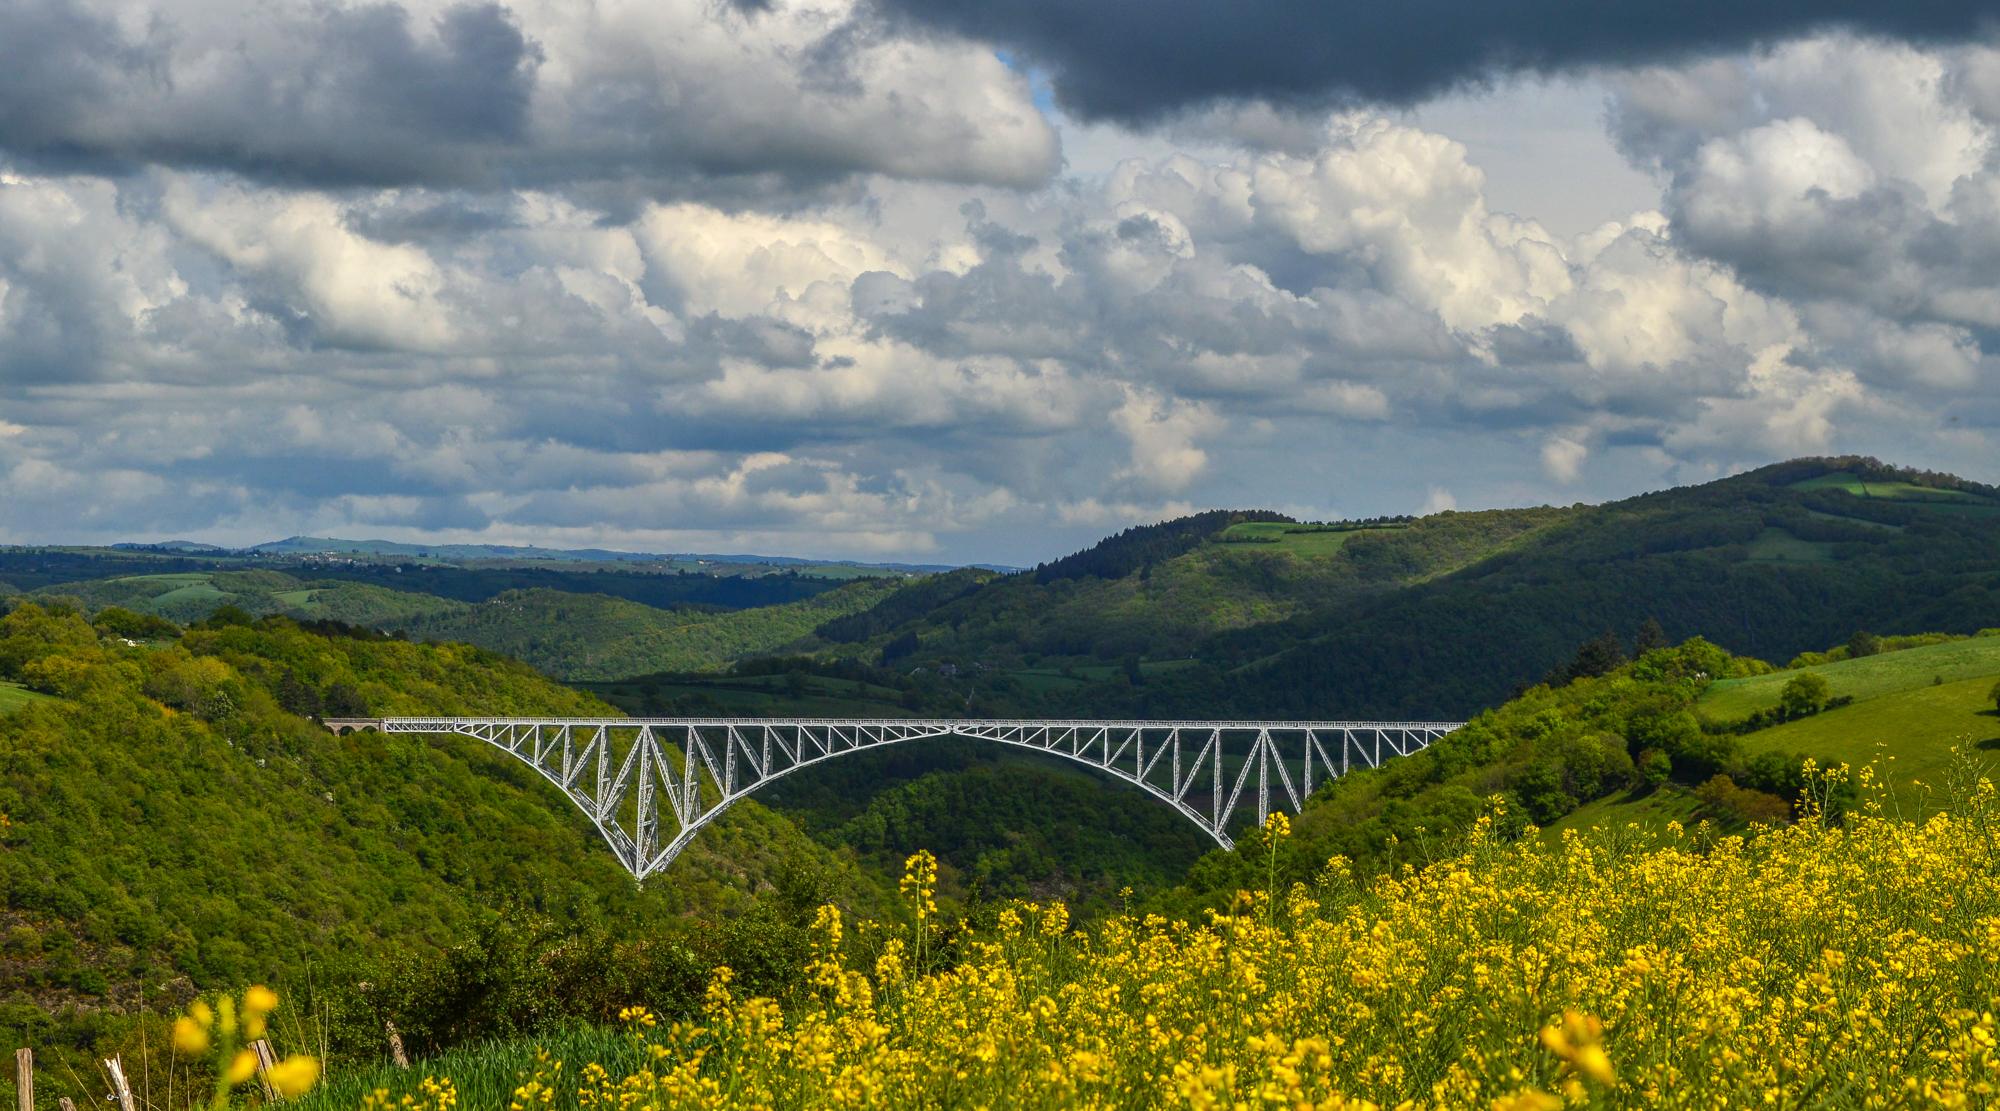 Viaduc du Viaur © A. Bec - OT Pays Ségali